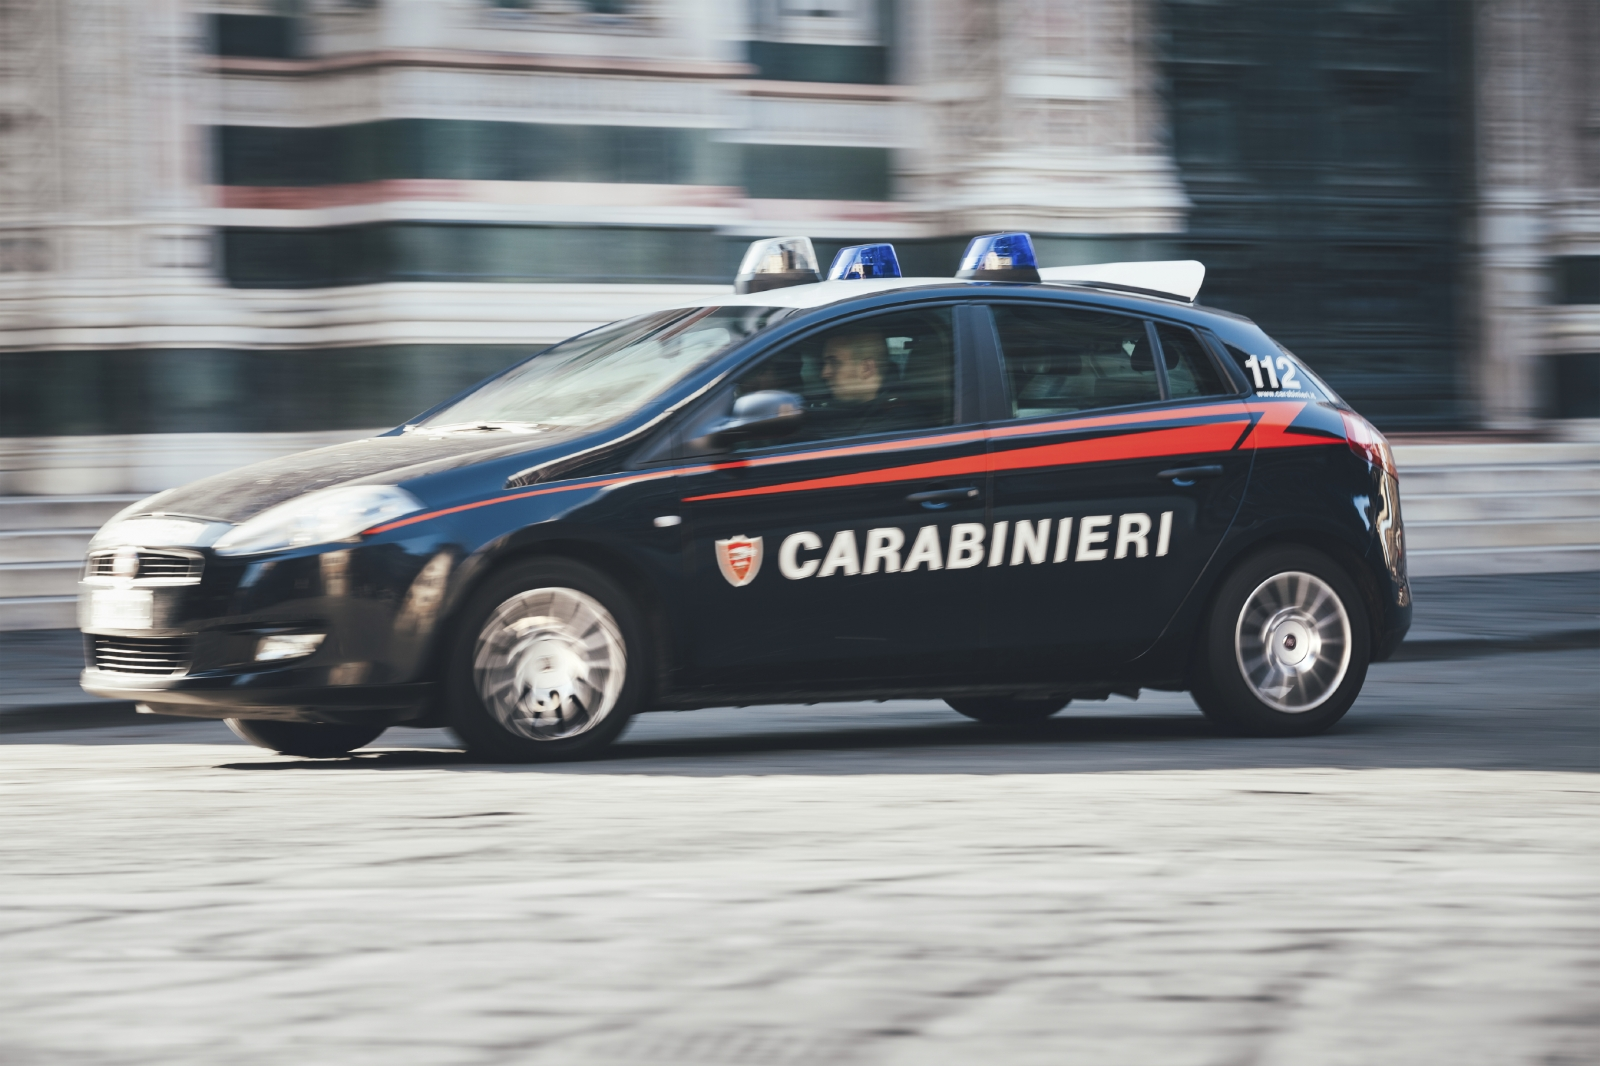 Italy:  Swedish model freed by Carabinieri